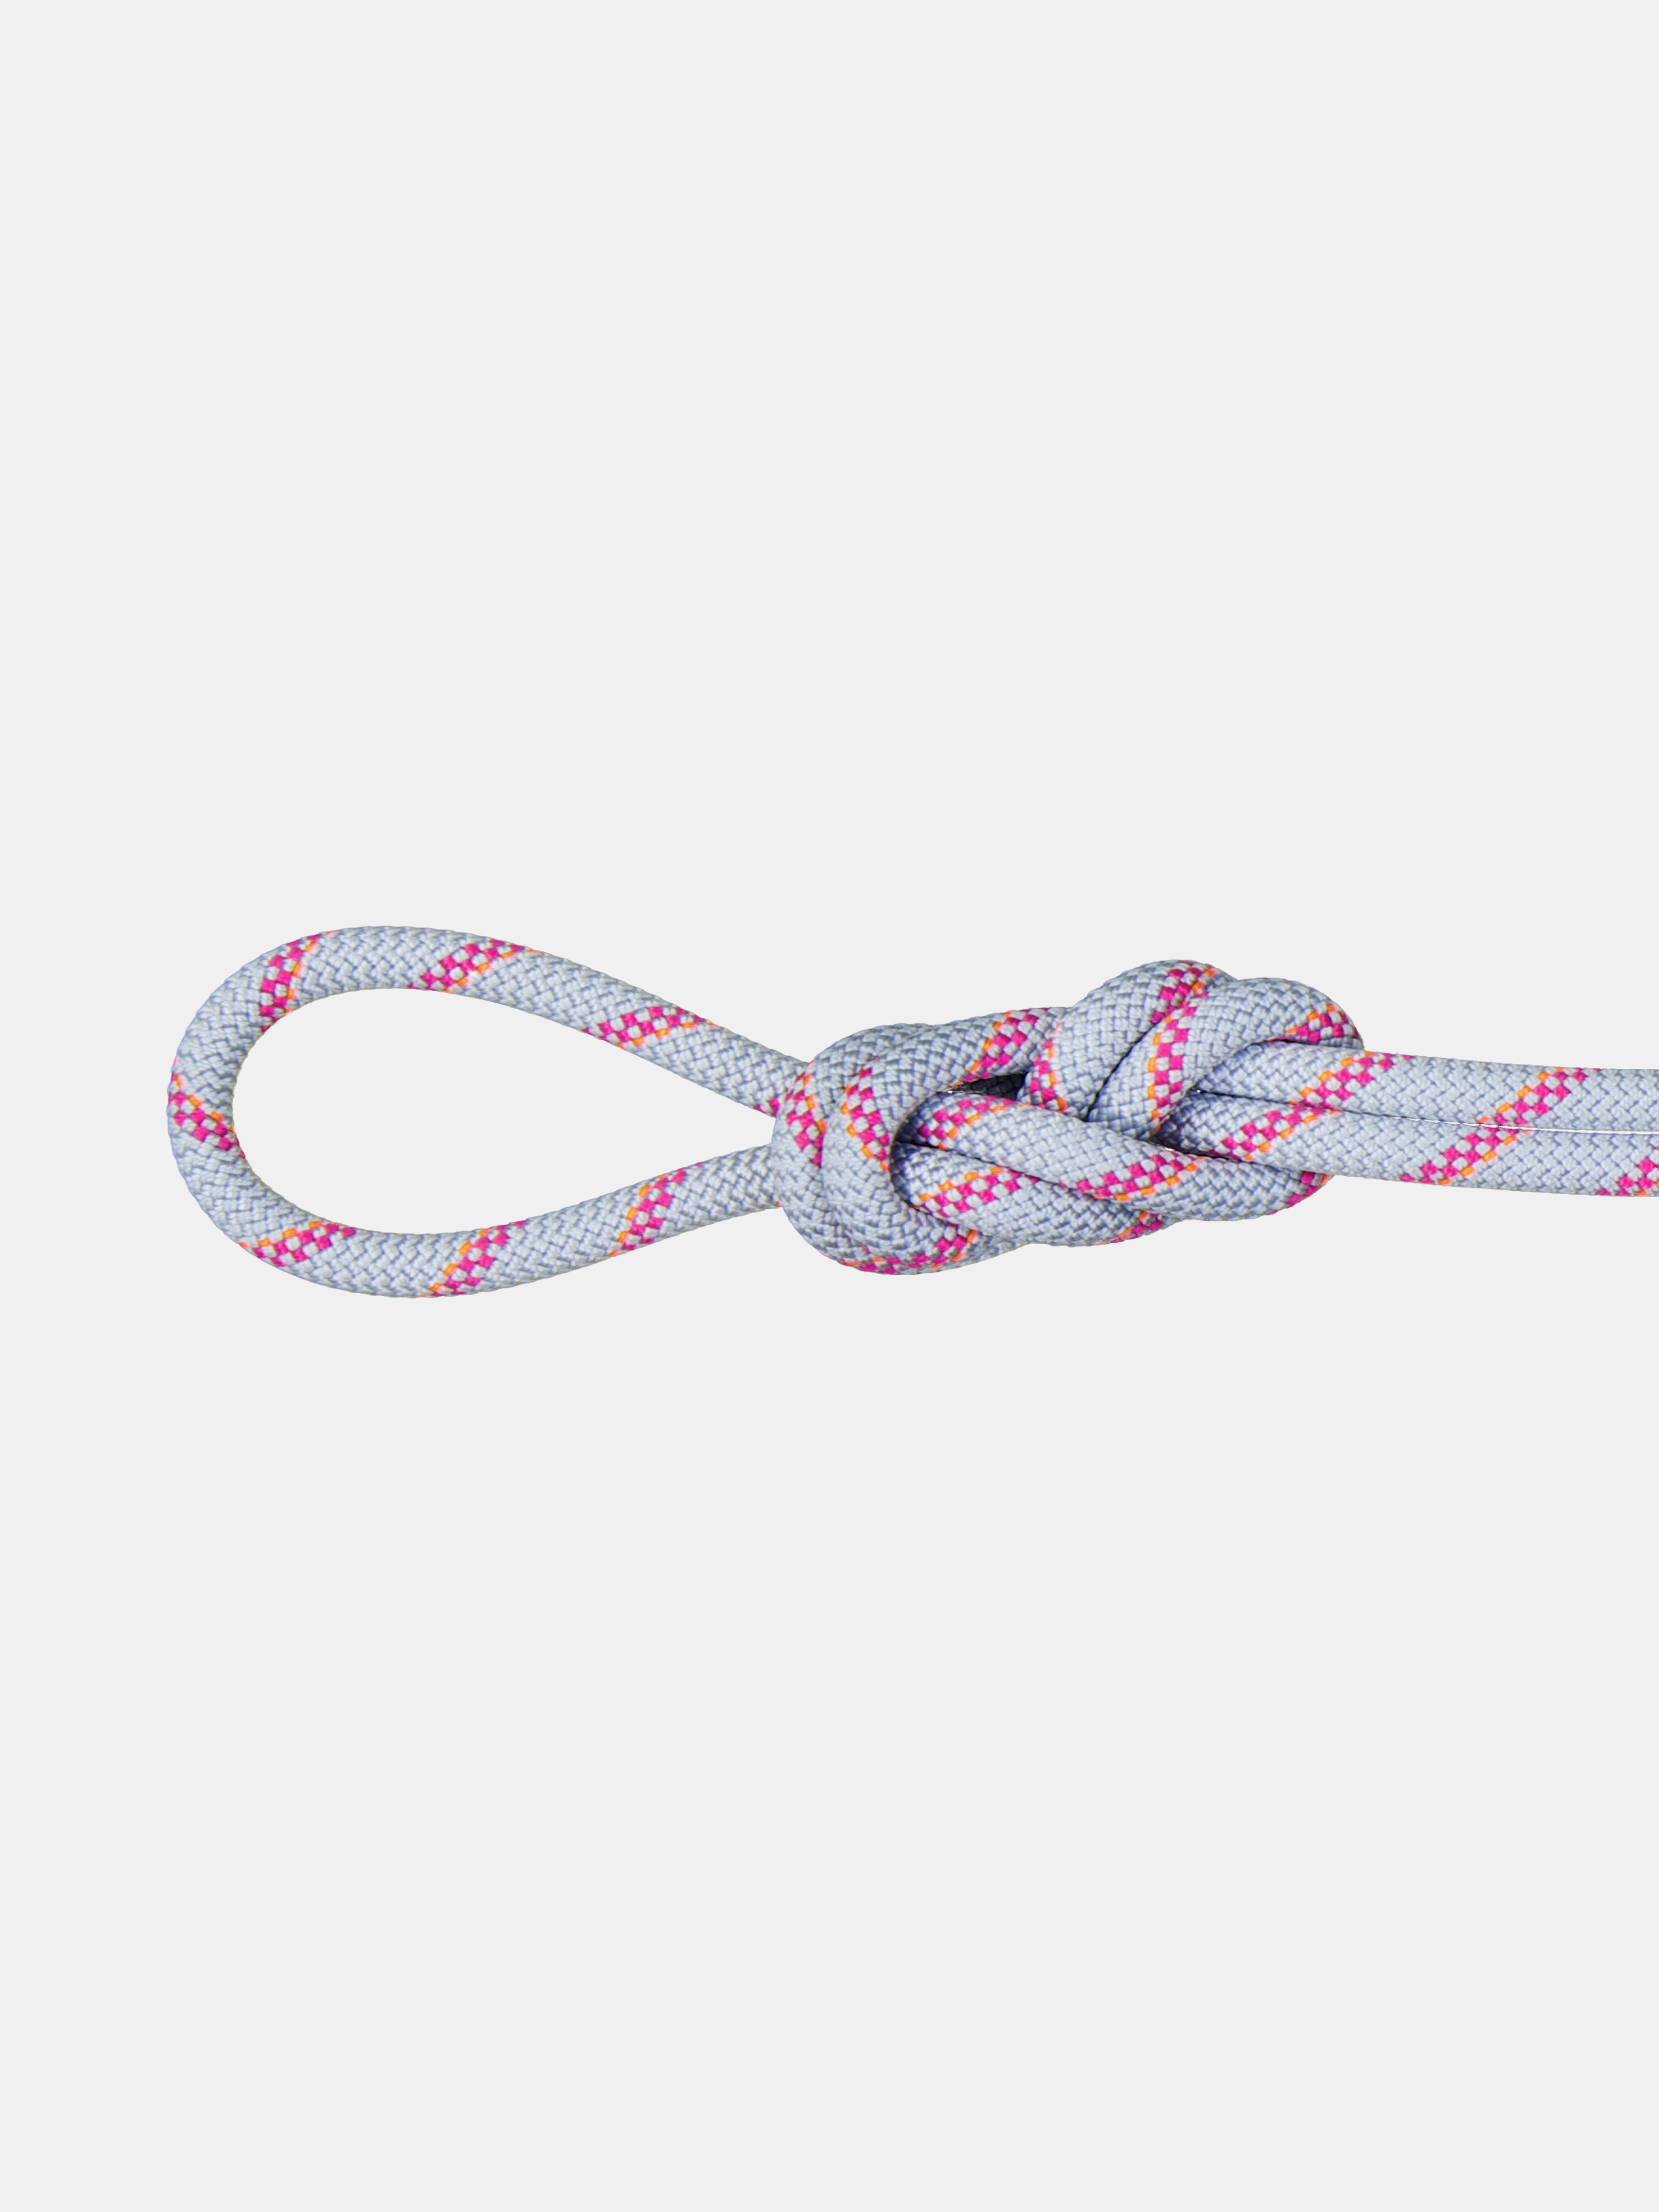 8.0 Alpine Dry Rope thumbnail